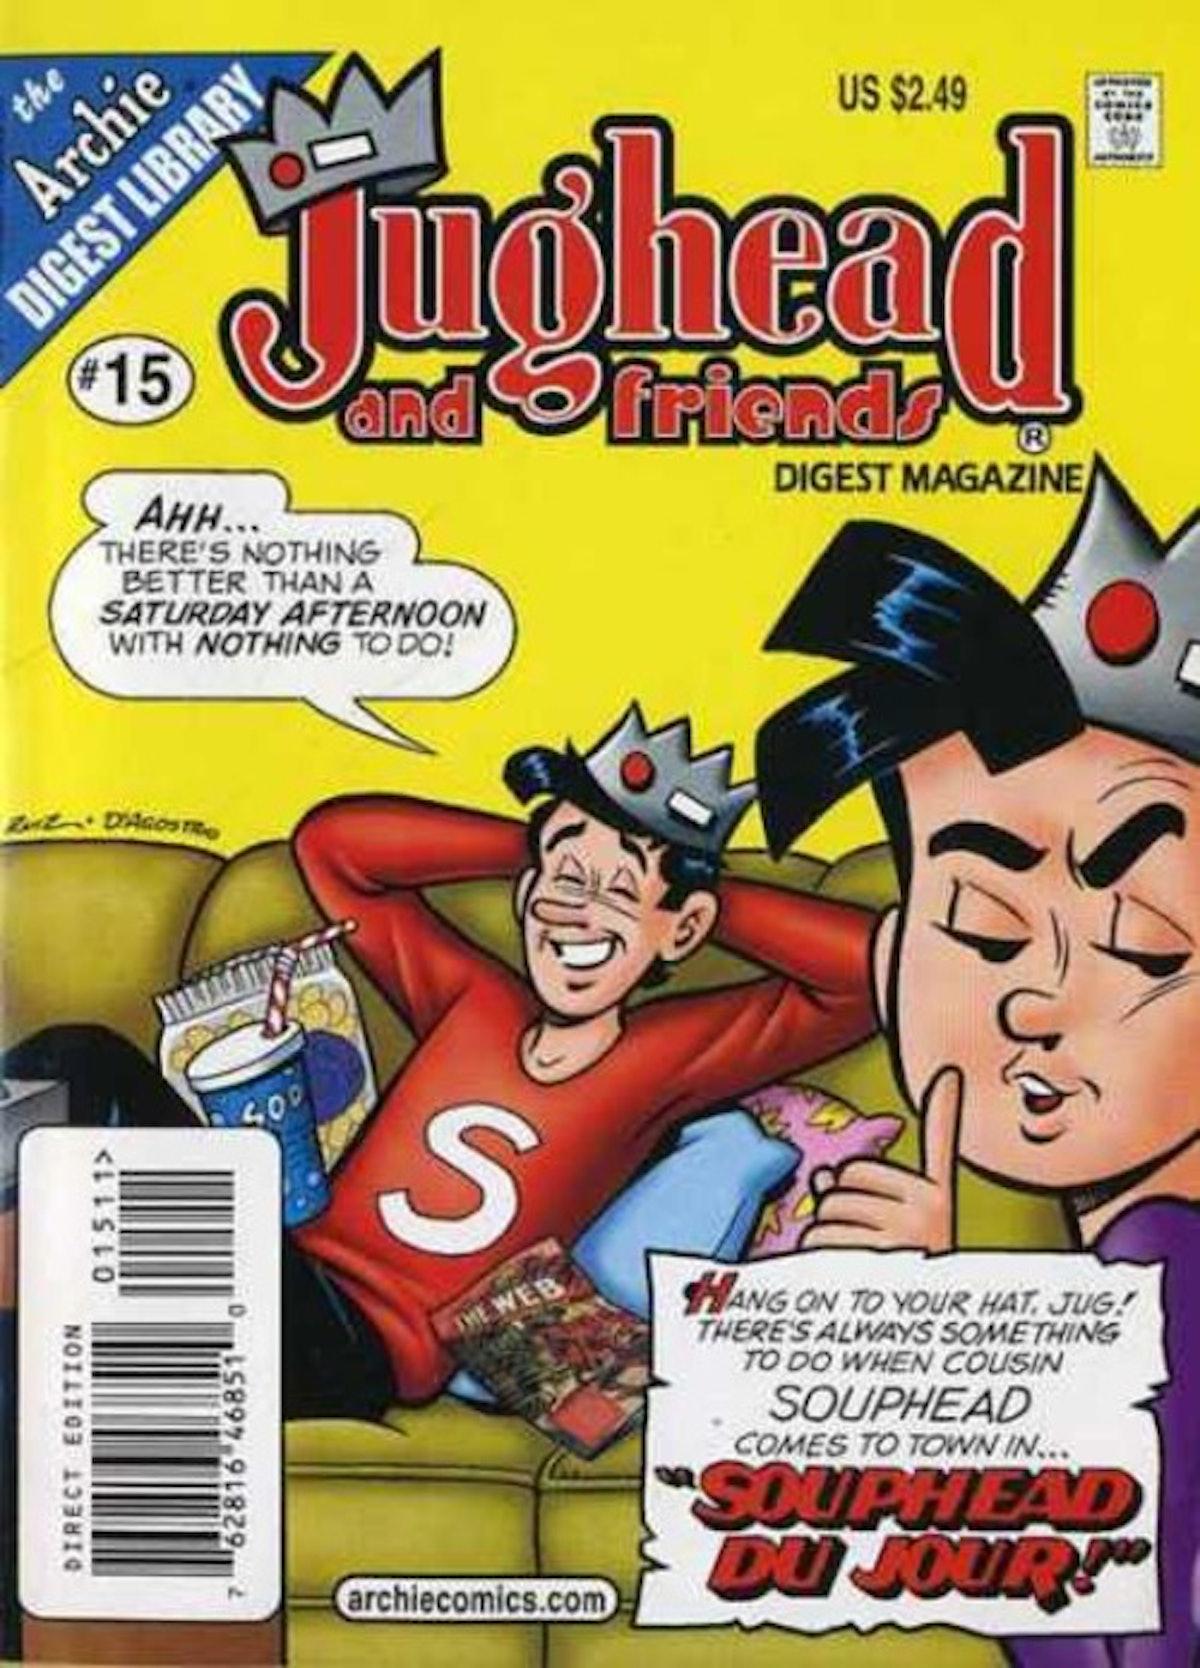 Jughead Jones has an identical cousin named Souphead in the Archie comics.